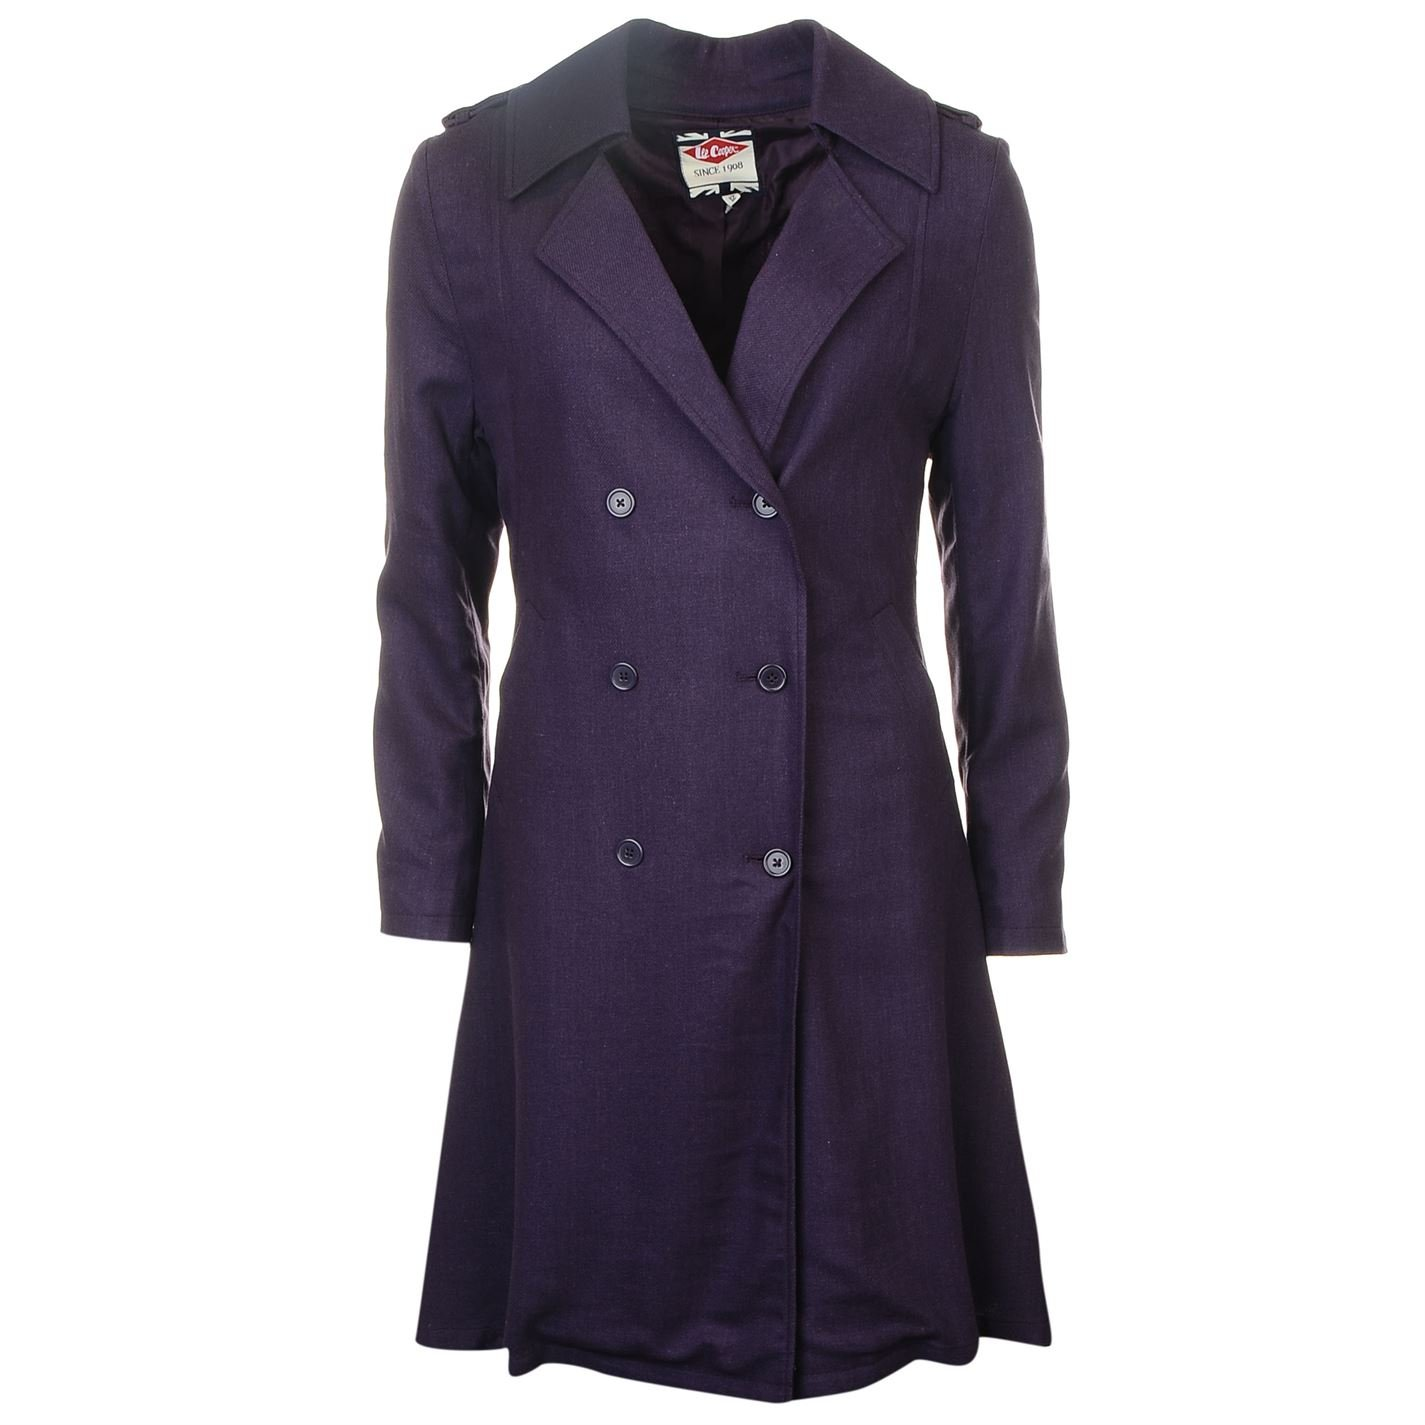 Lee Cooper Womens Trench Coat Mac Top Jacket Long Sleeve Lightweight Fold Over Purple 8 (XS)